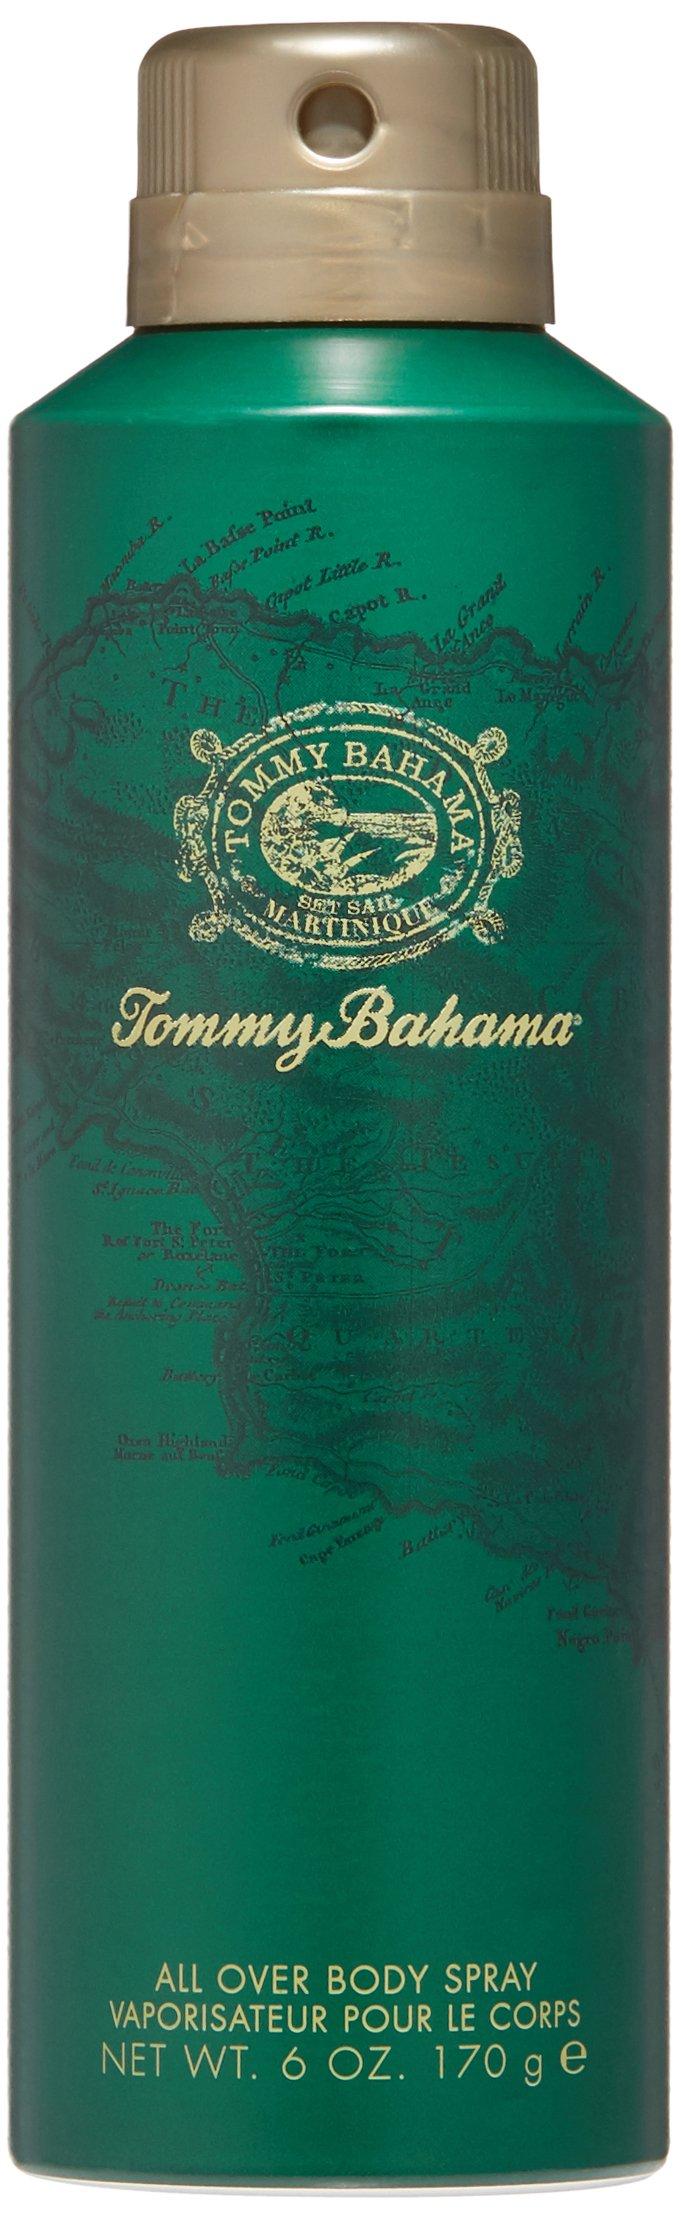 Tommy Bahama Body Spray , 6.0 oz